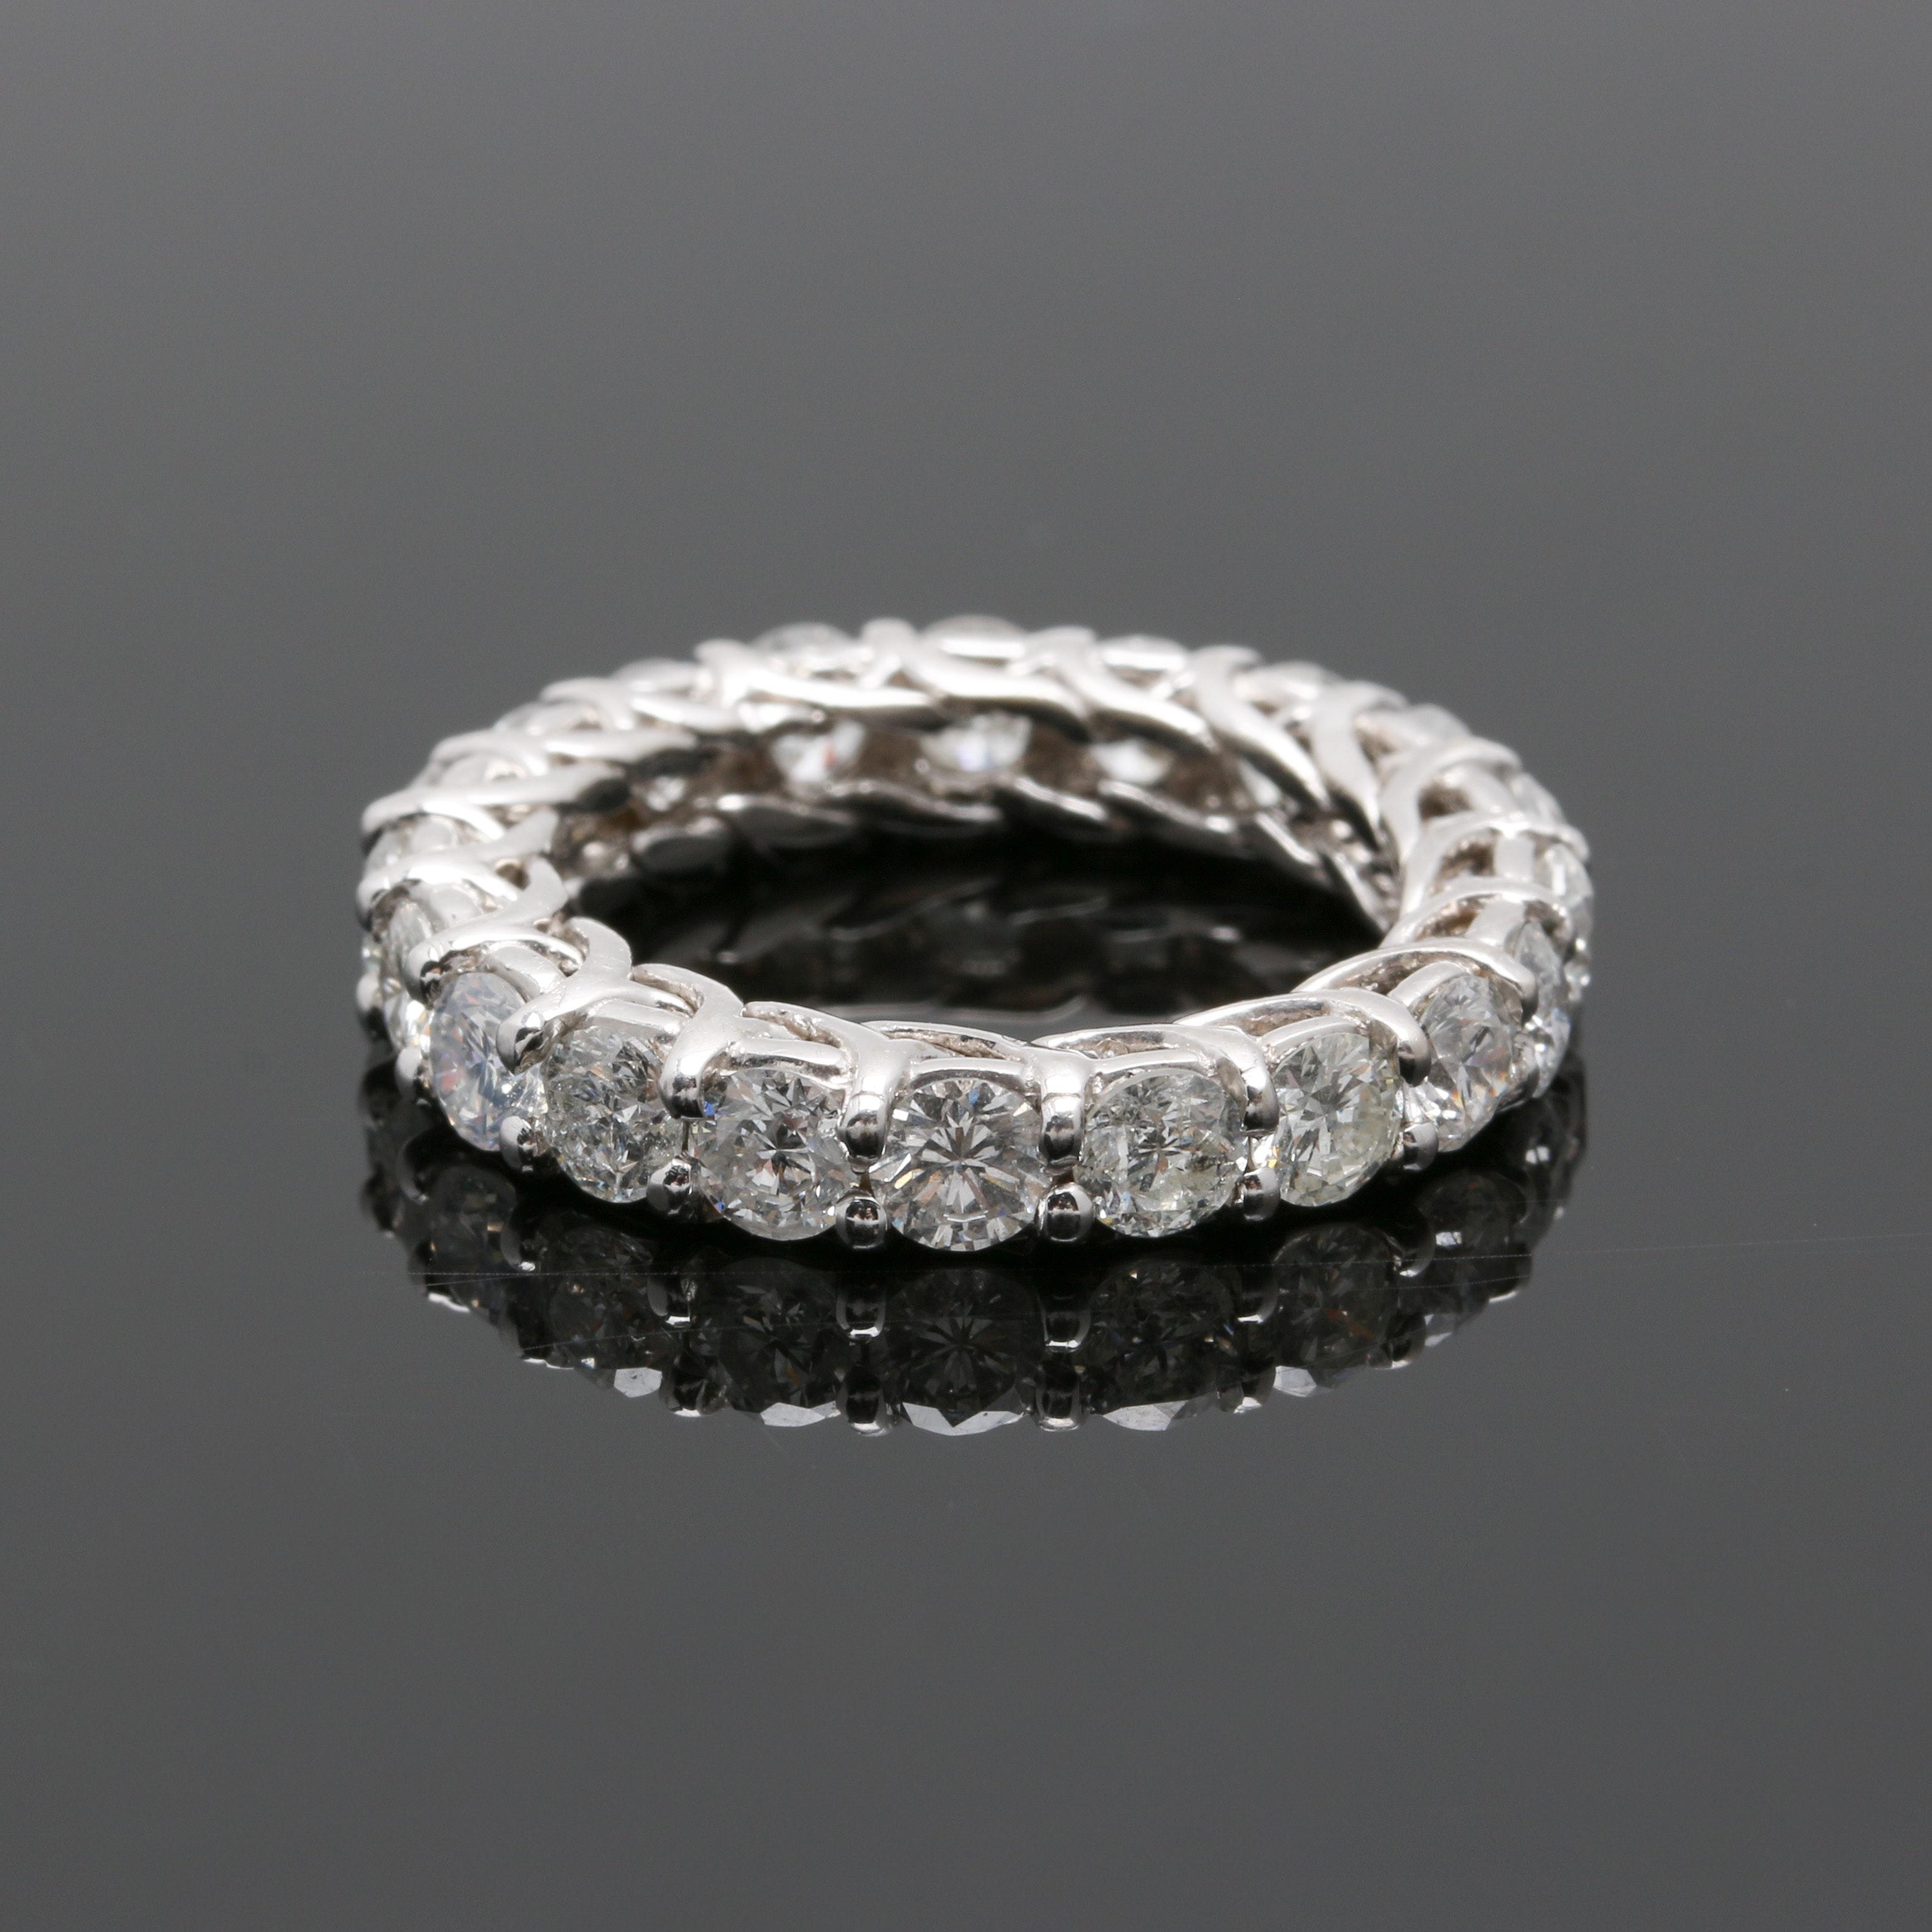 14K White Gold 3.07 CTW Diamond Eternity Ring Band